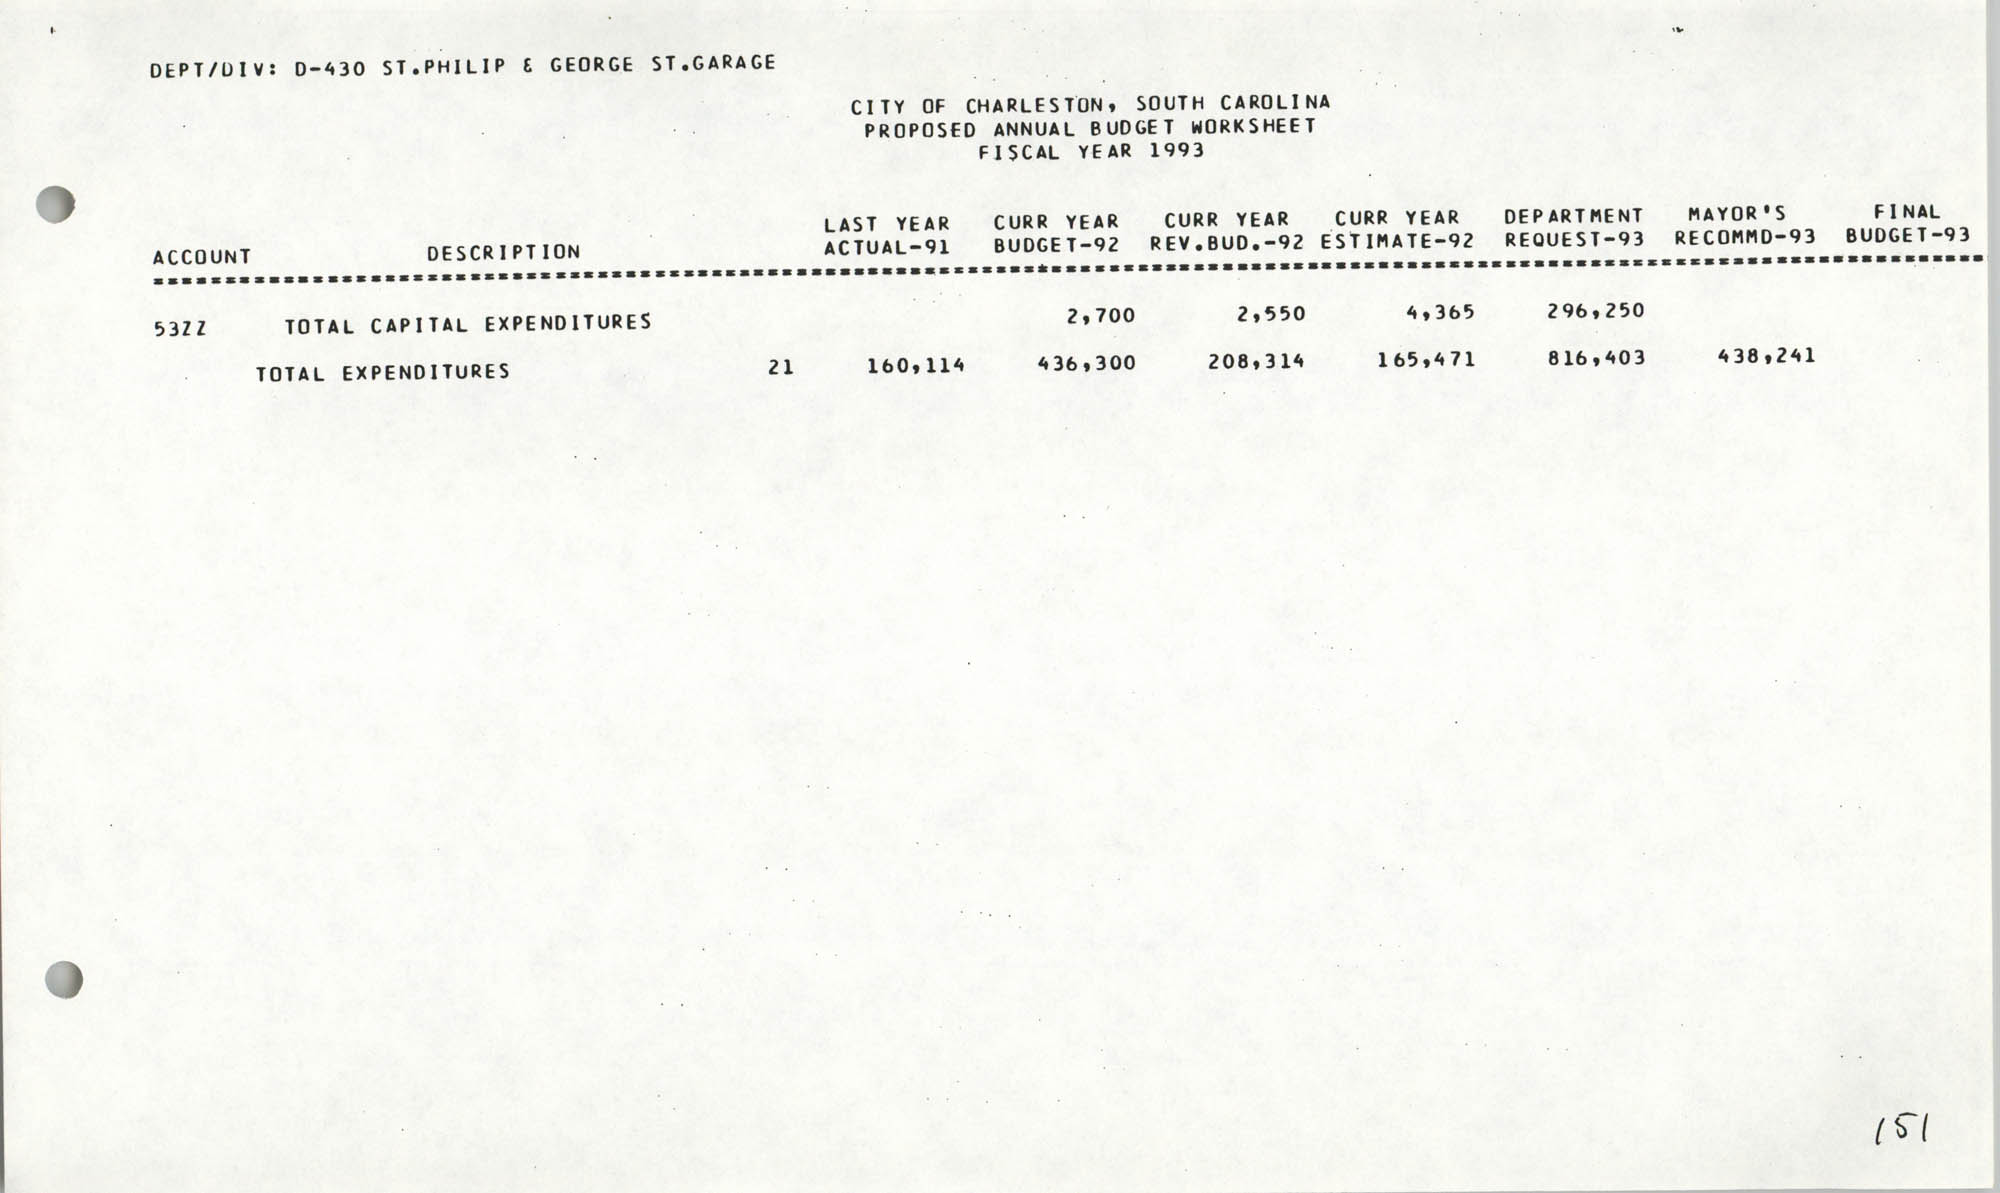 The City Council of Charleston, South Carolina, 1993 Budget, Page 151